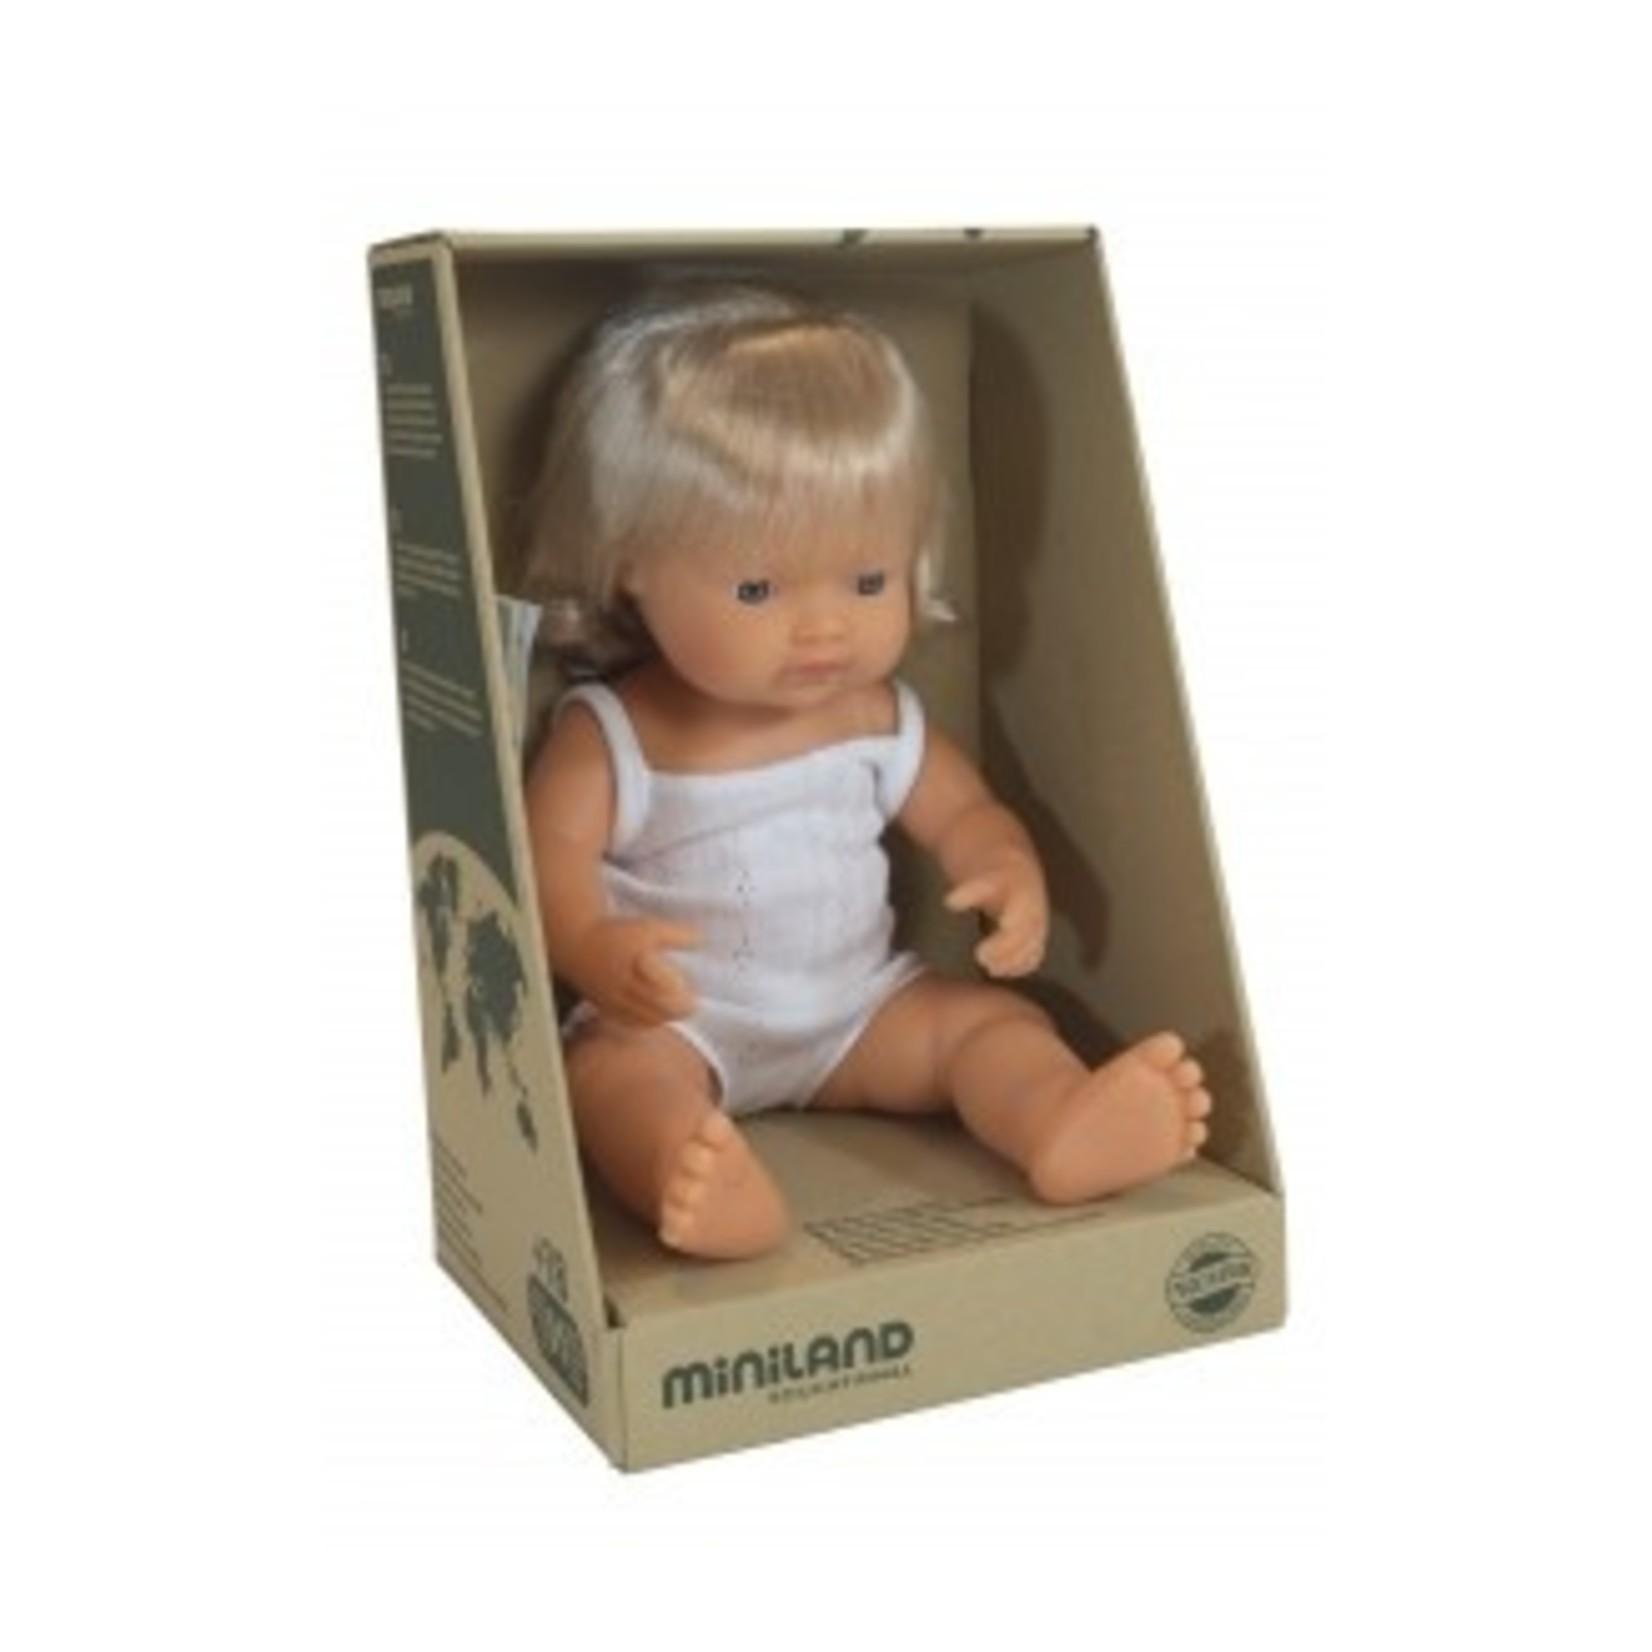 Miniland Miniland 38cm Doll